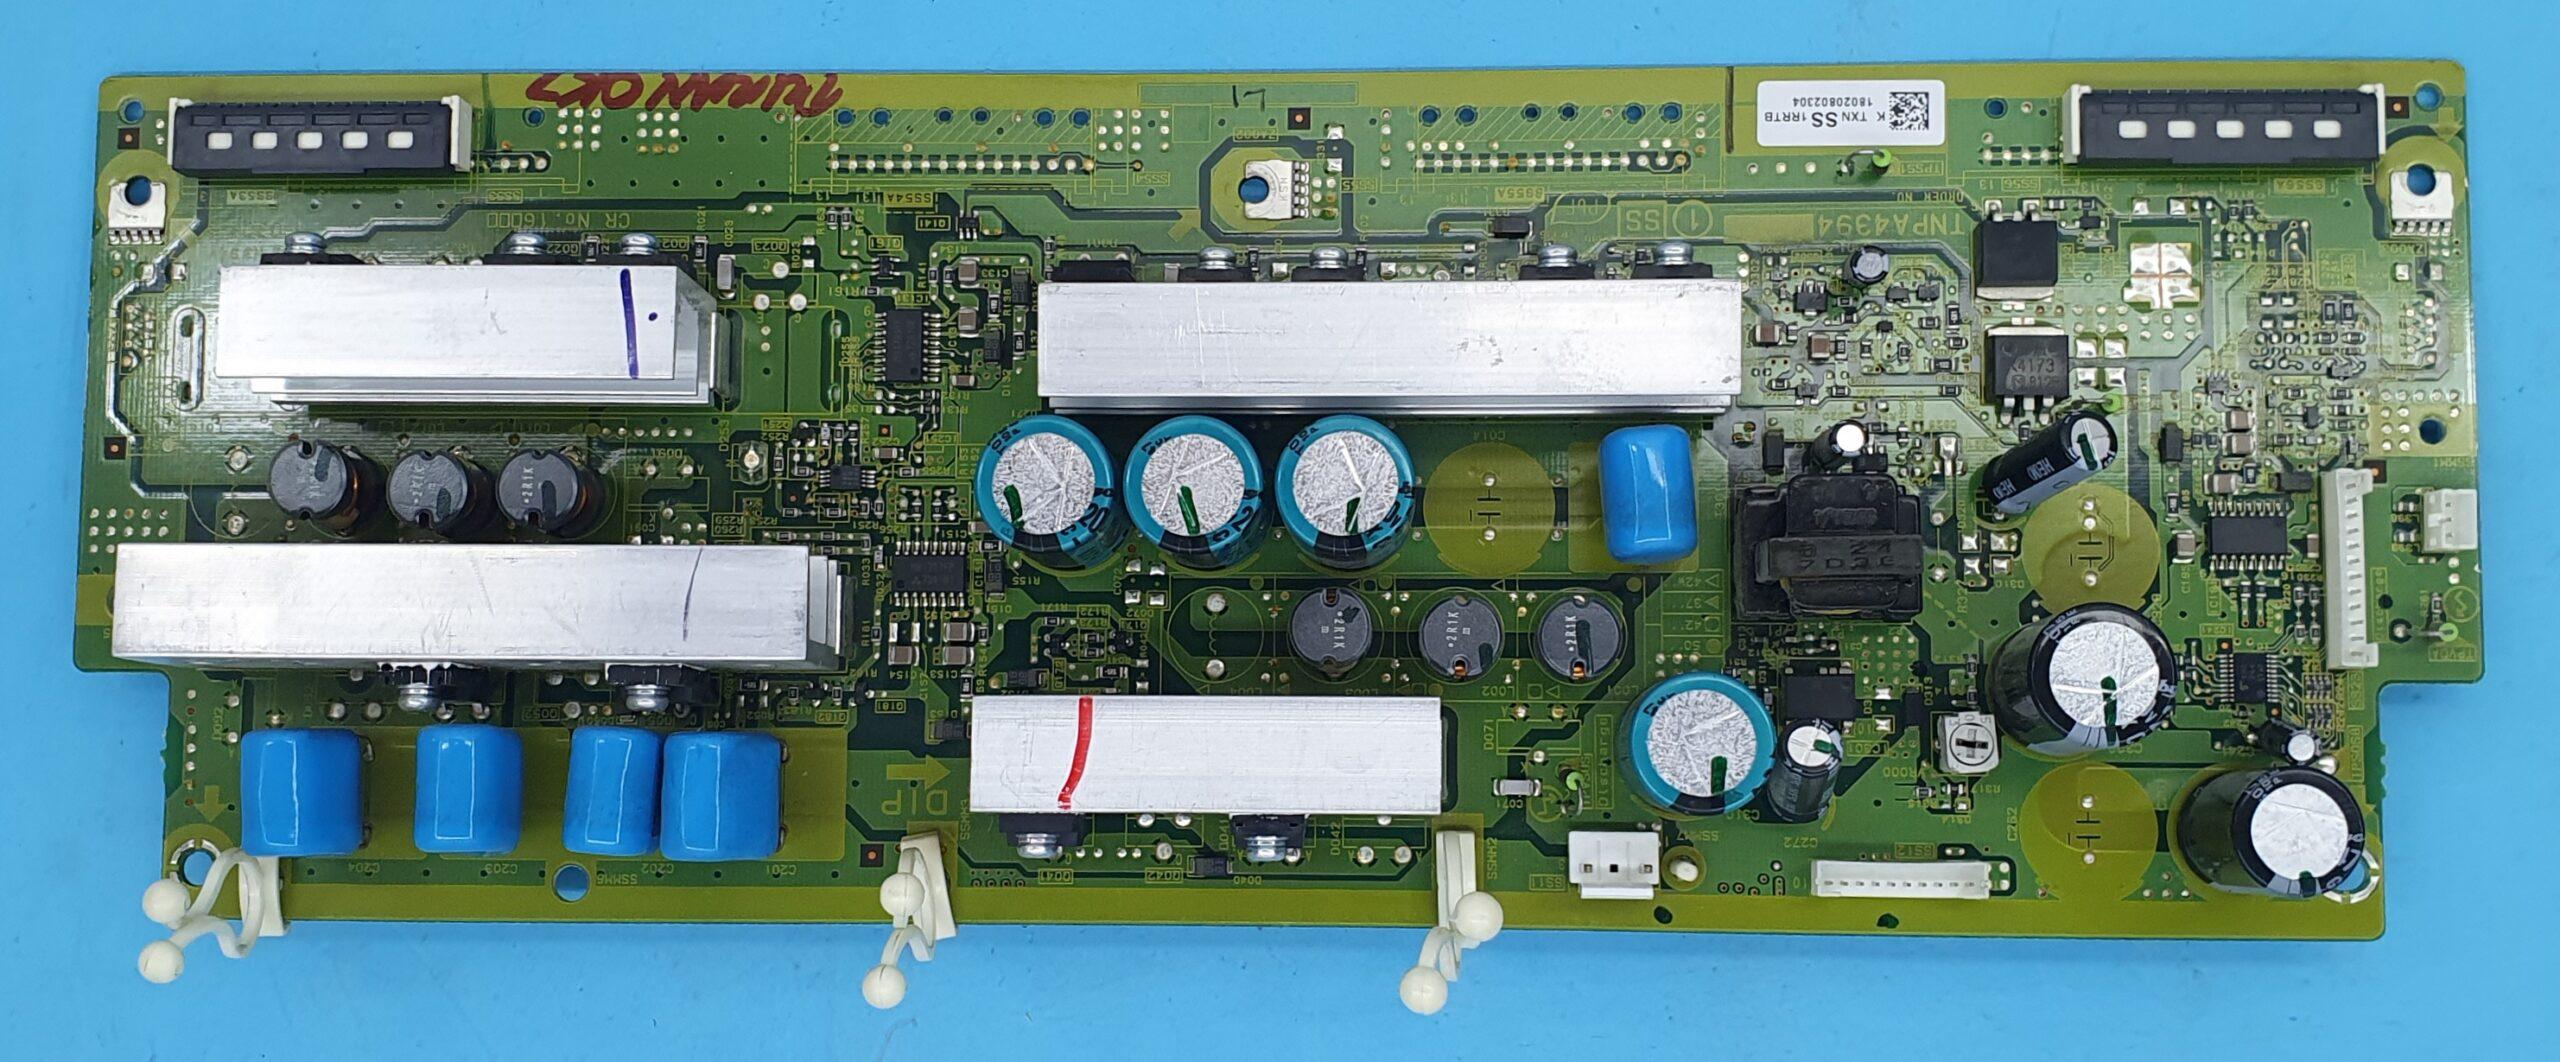 TNPA4394 Panasonic Z-SUS (KDV DAHİL = 150 TL)